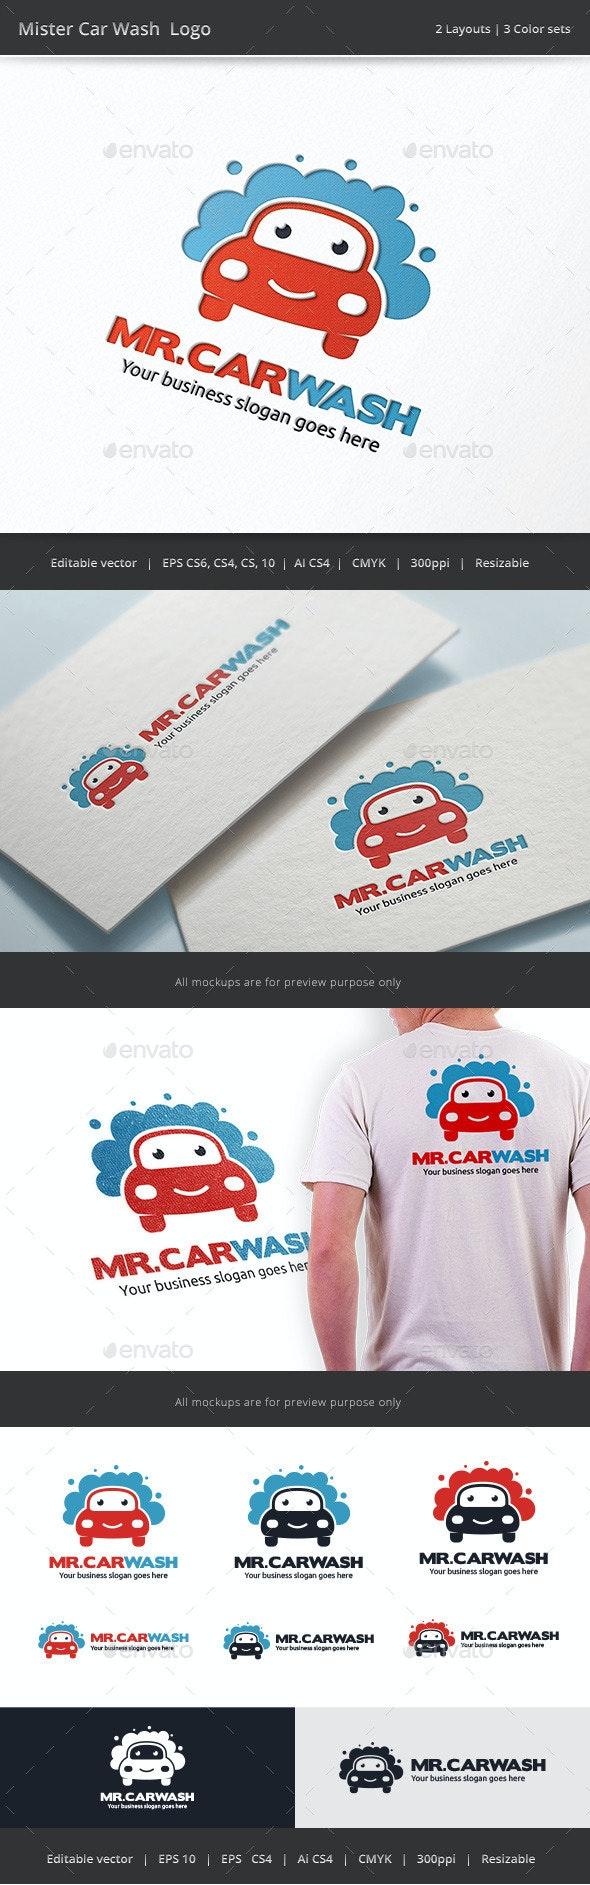 Mister Car Wash Logo - Objects Logo Templates